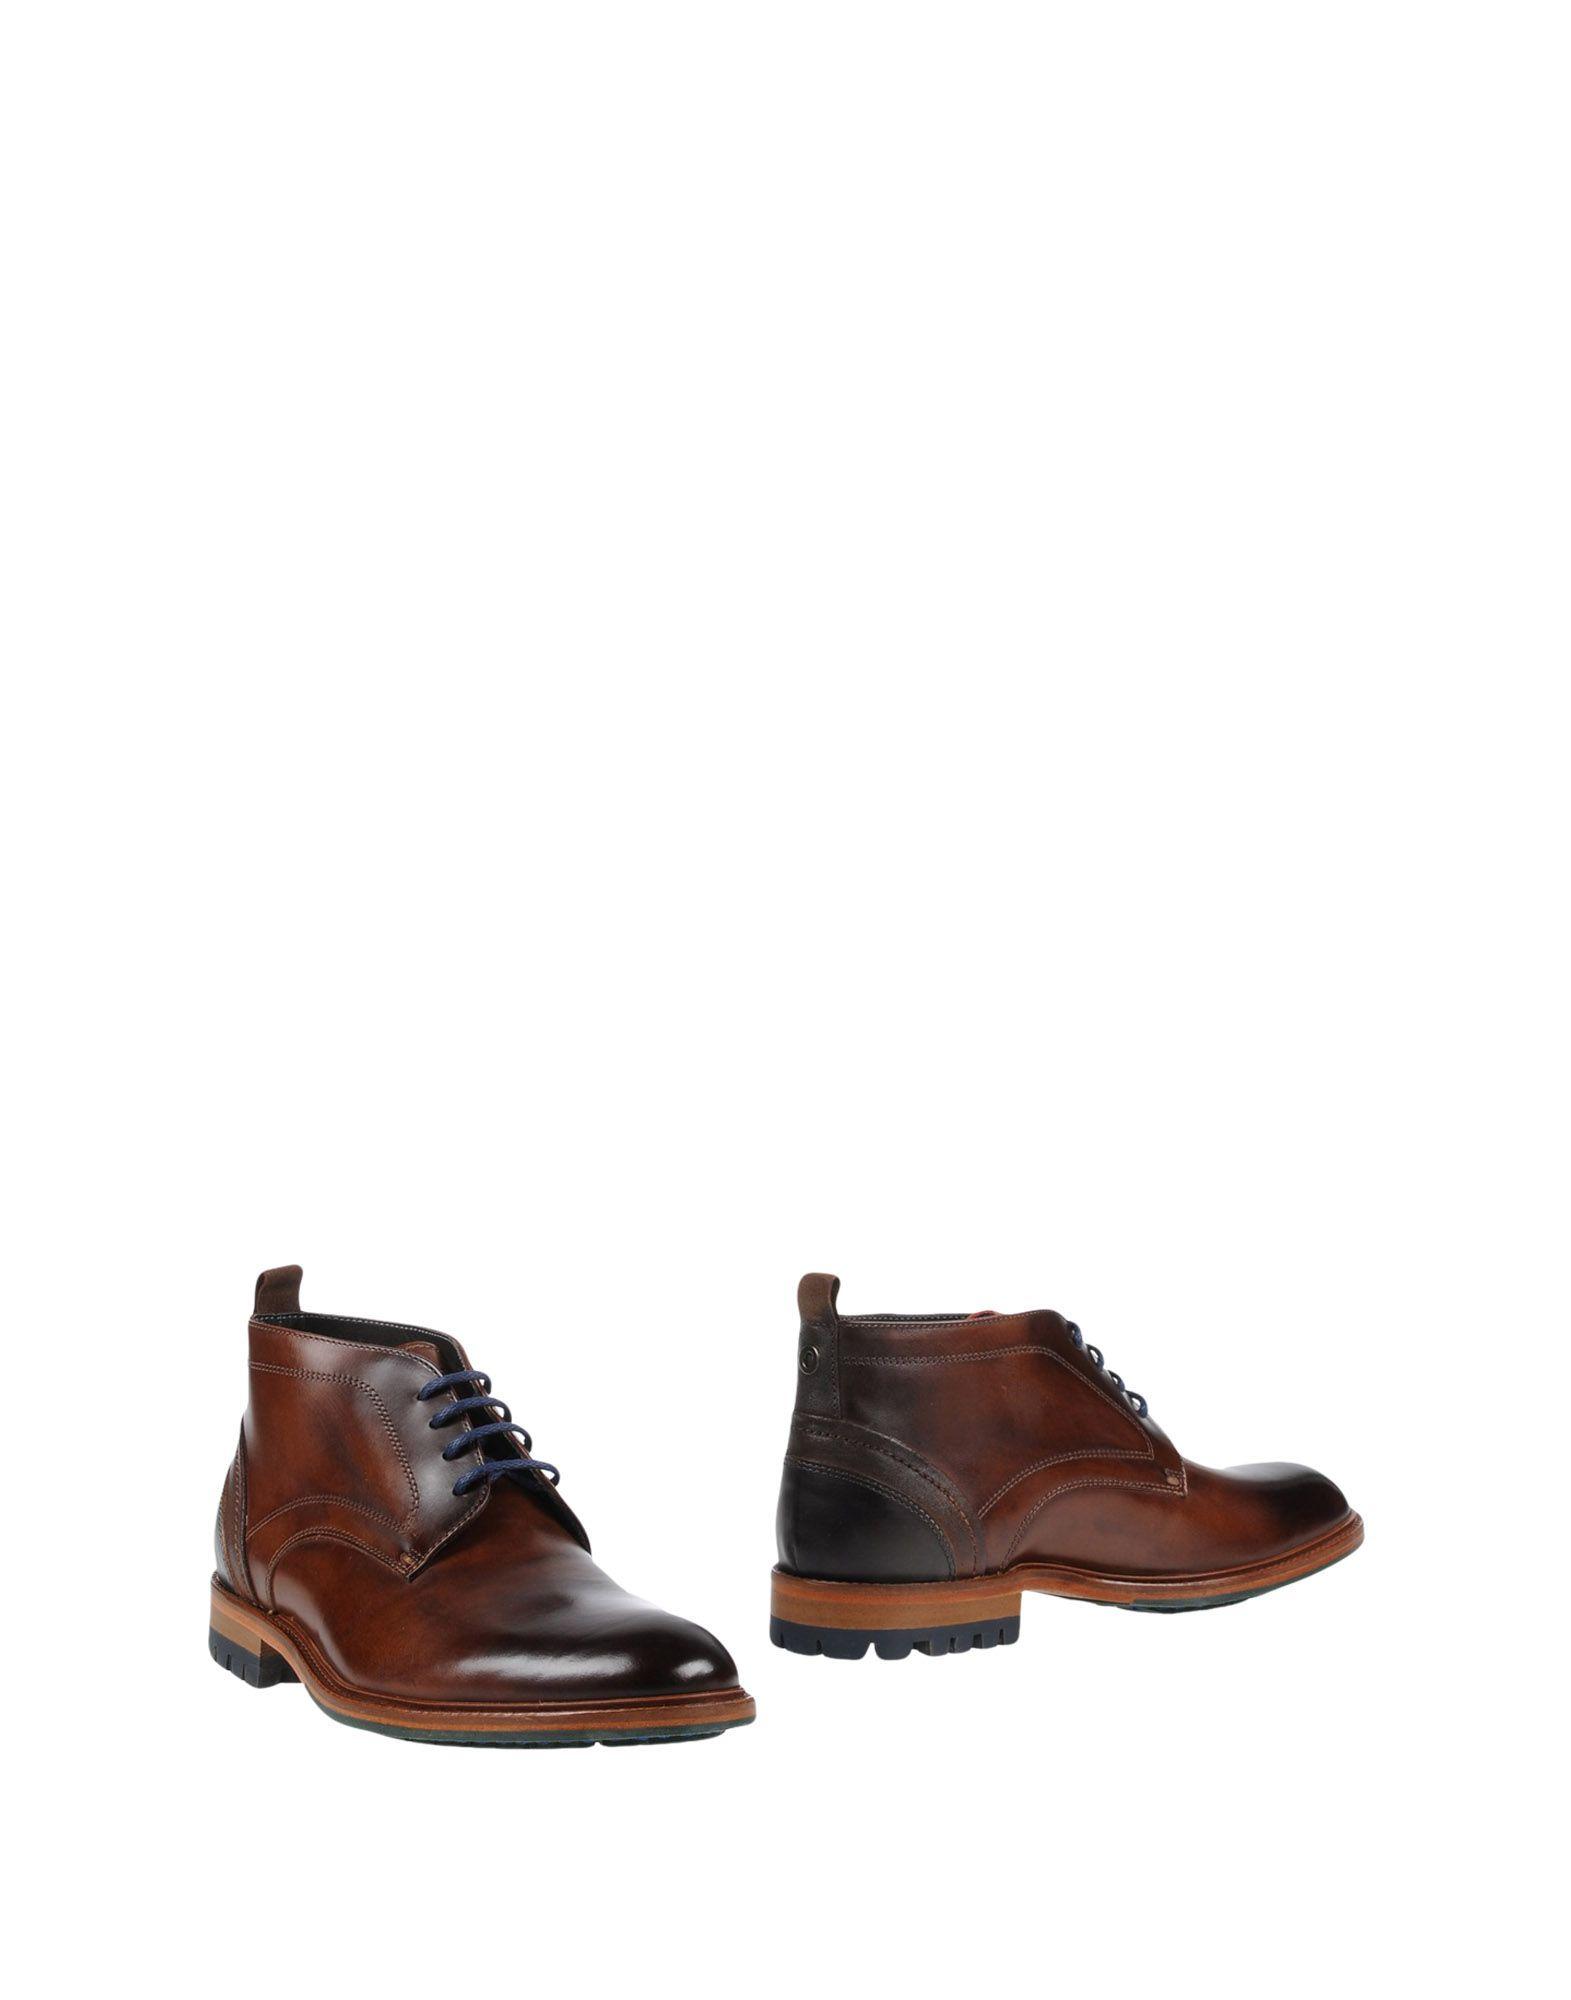 FIORANGELO Полусапоги и высокие ботинки fiorangelo полусапоги и высокие ботинки